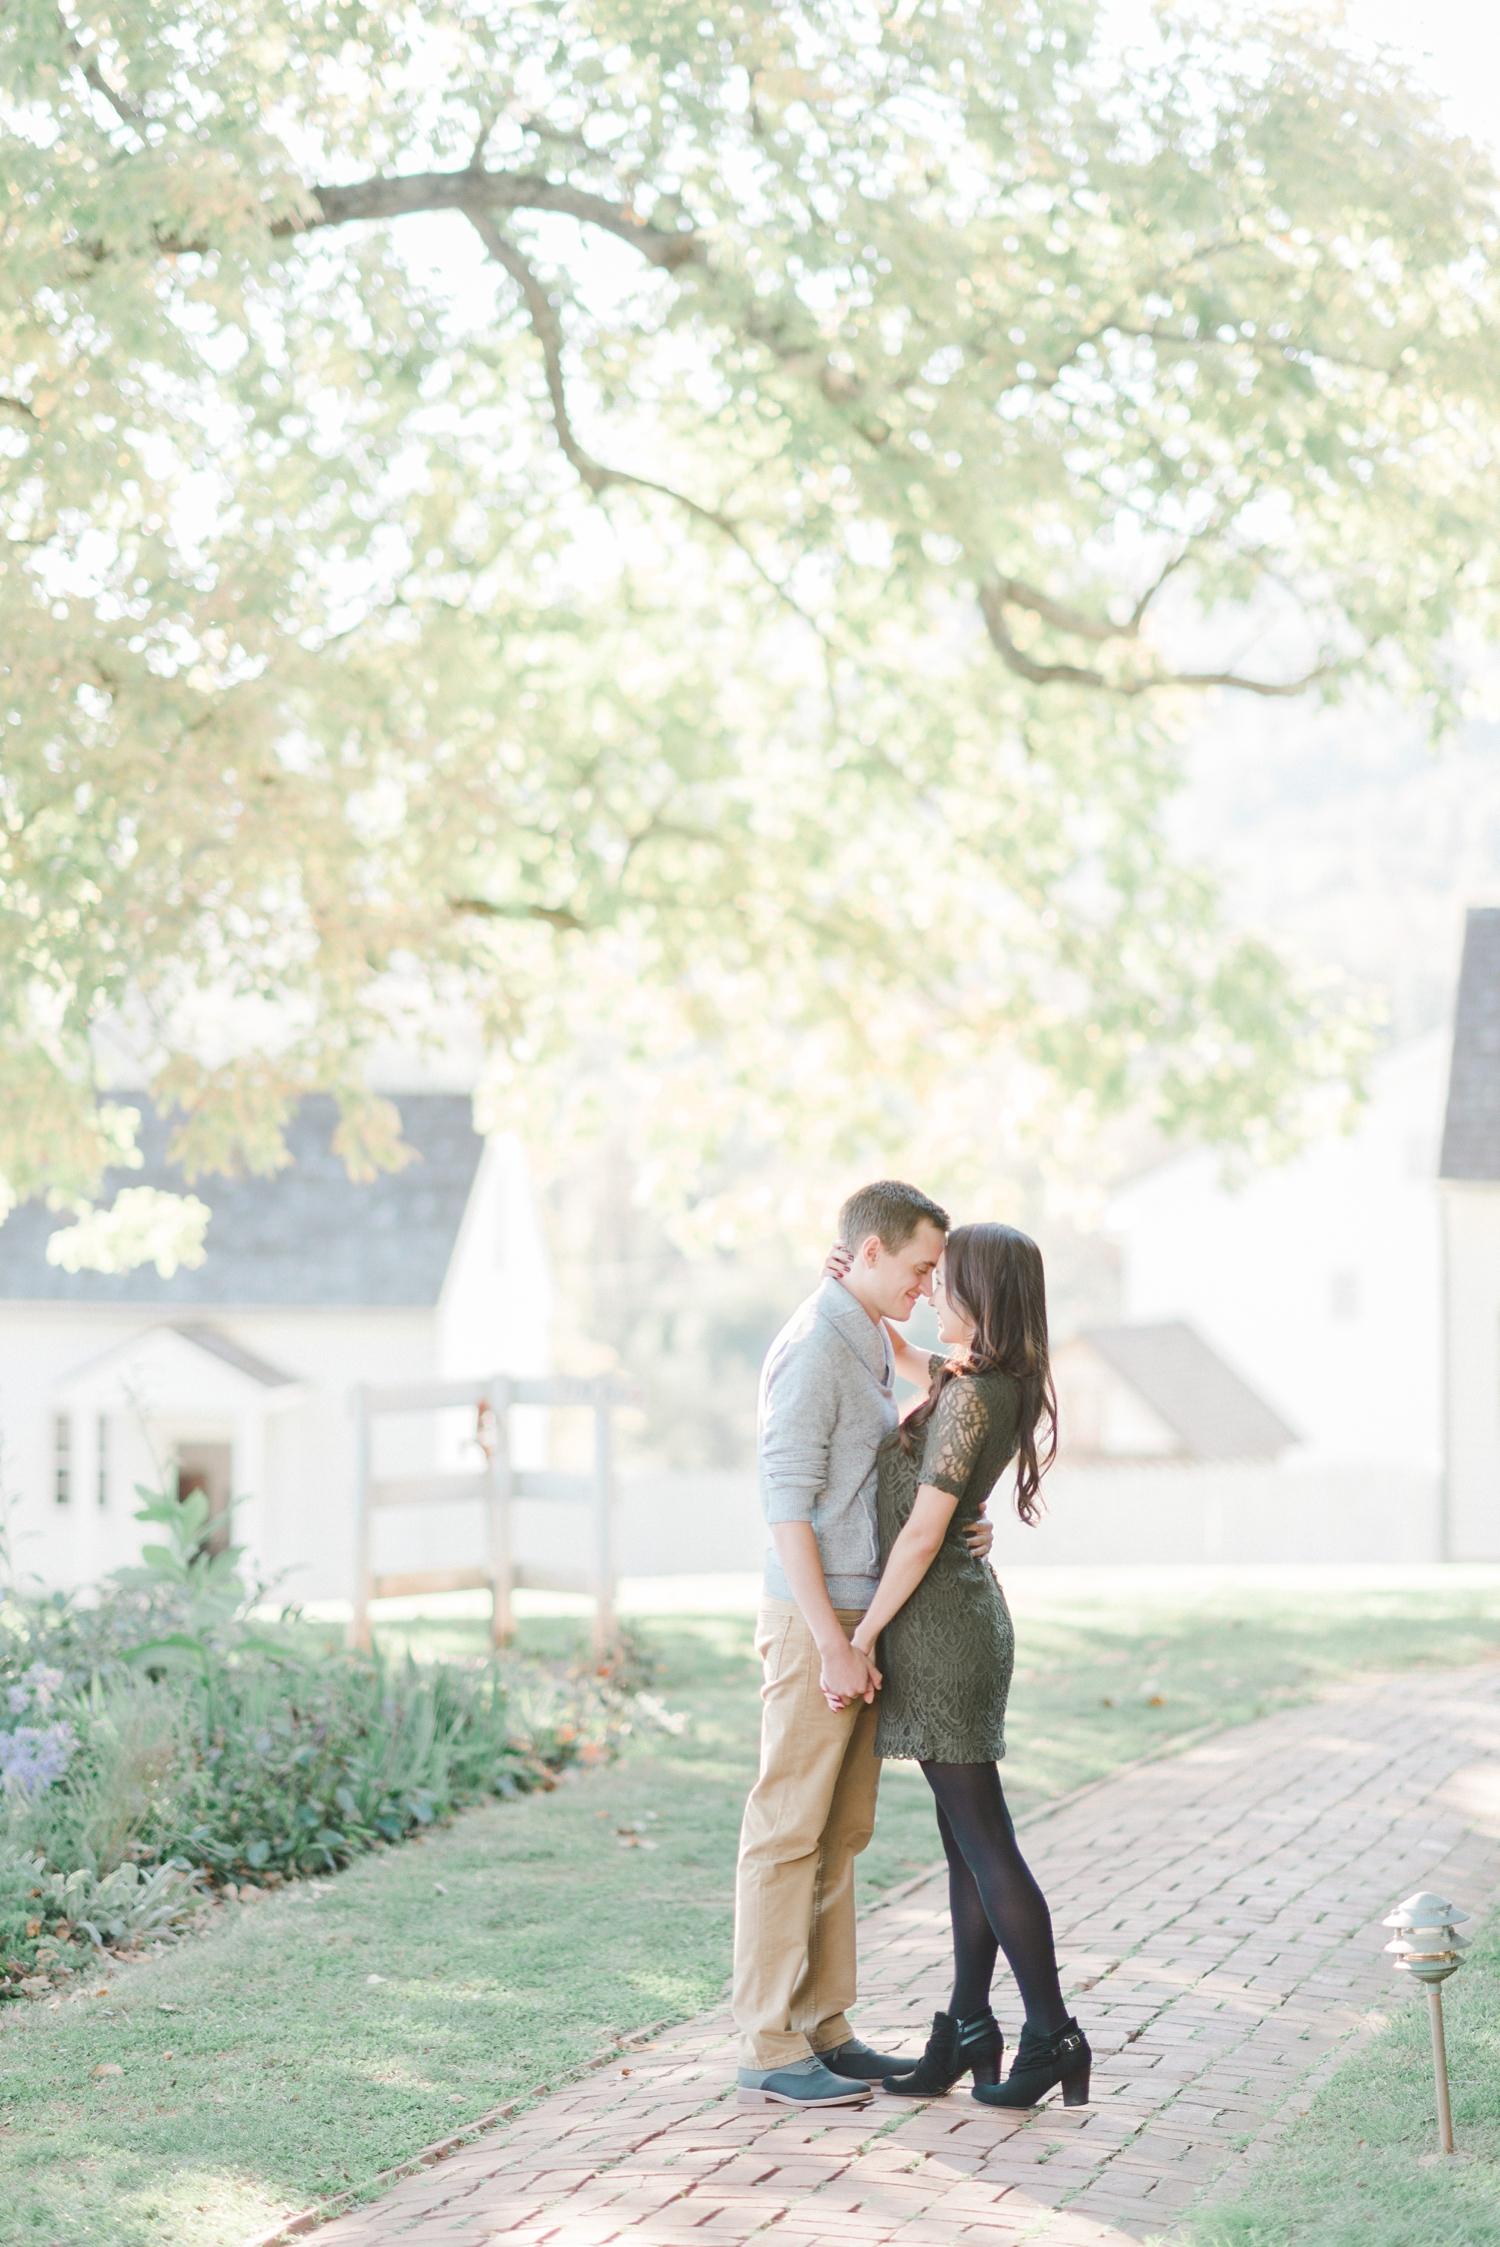 charlottesville_engagement_ashlawn_highland_0003.jpg